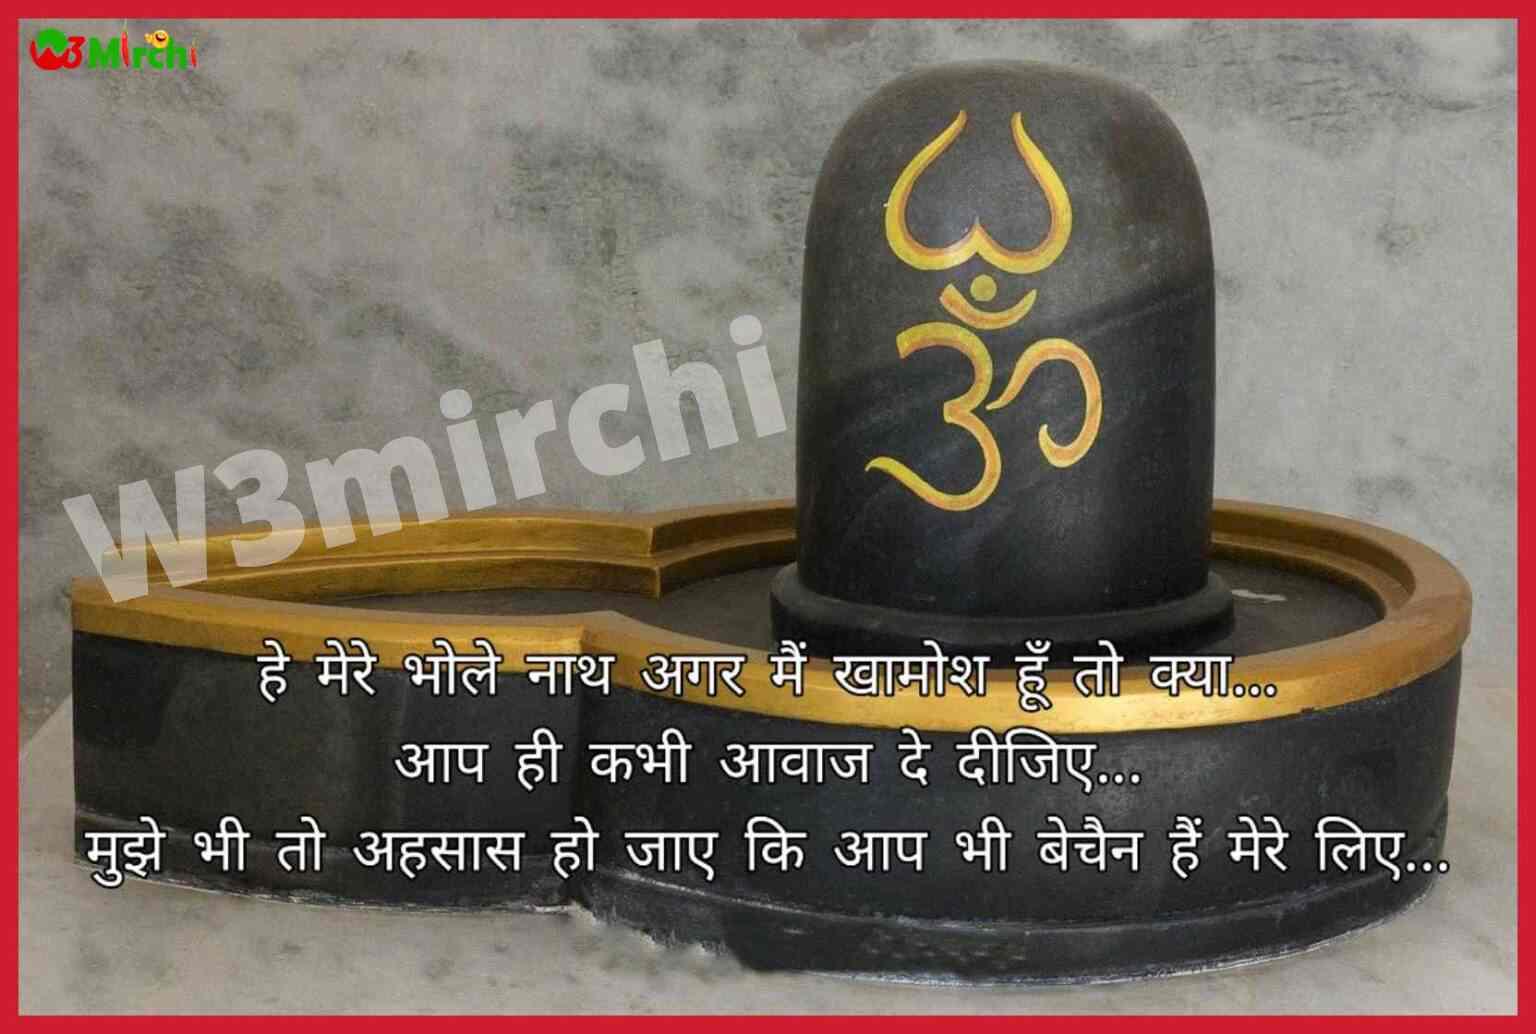 Bhagwan Shayari    हे मेरे भोले नाथ अगर